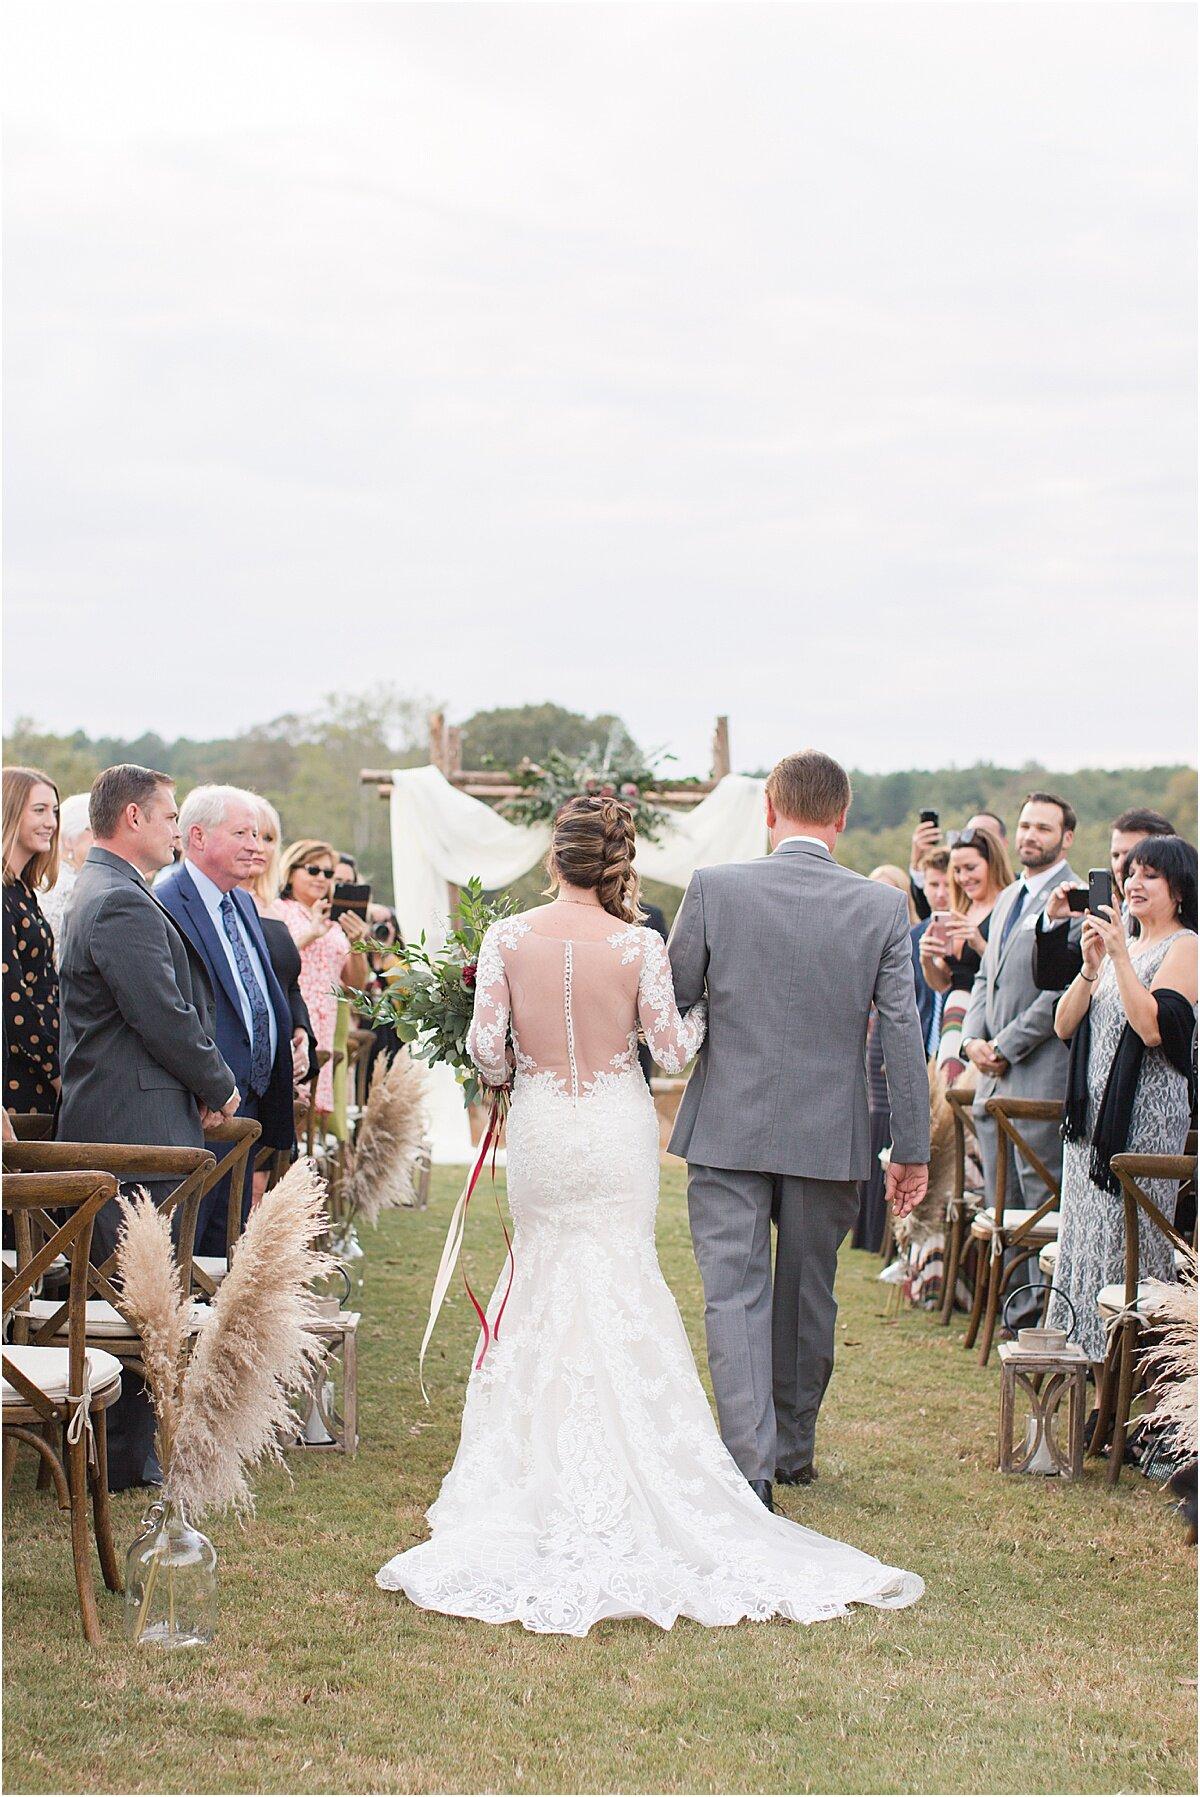 Jersey_Ga_Wedding_Venues_Holly_L_Robbins_Photography_0075.jpg